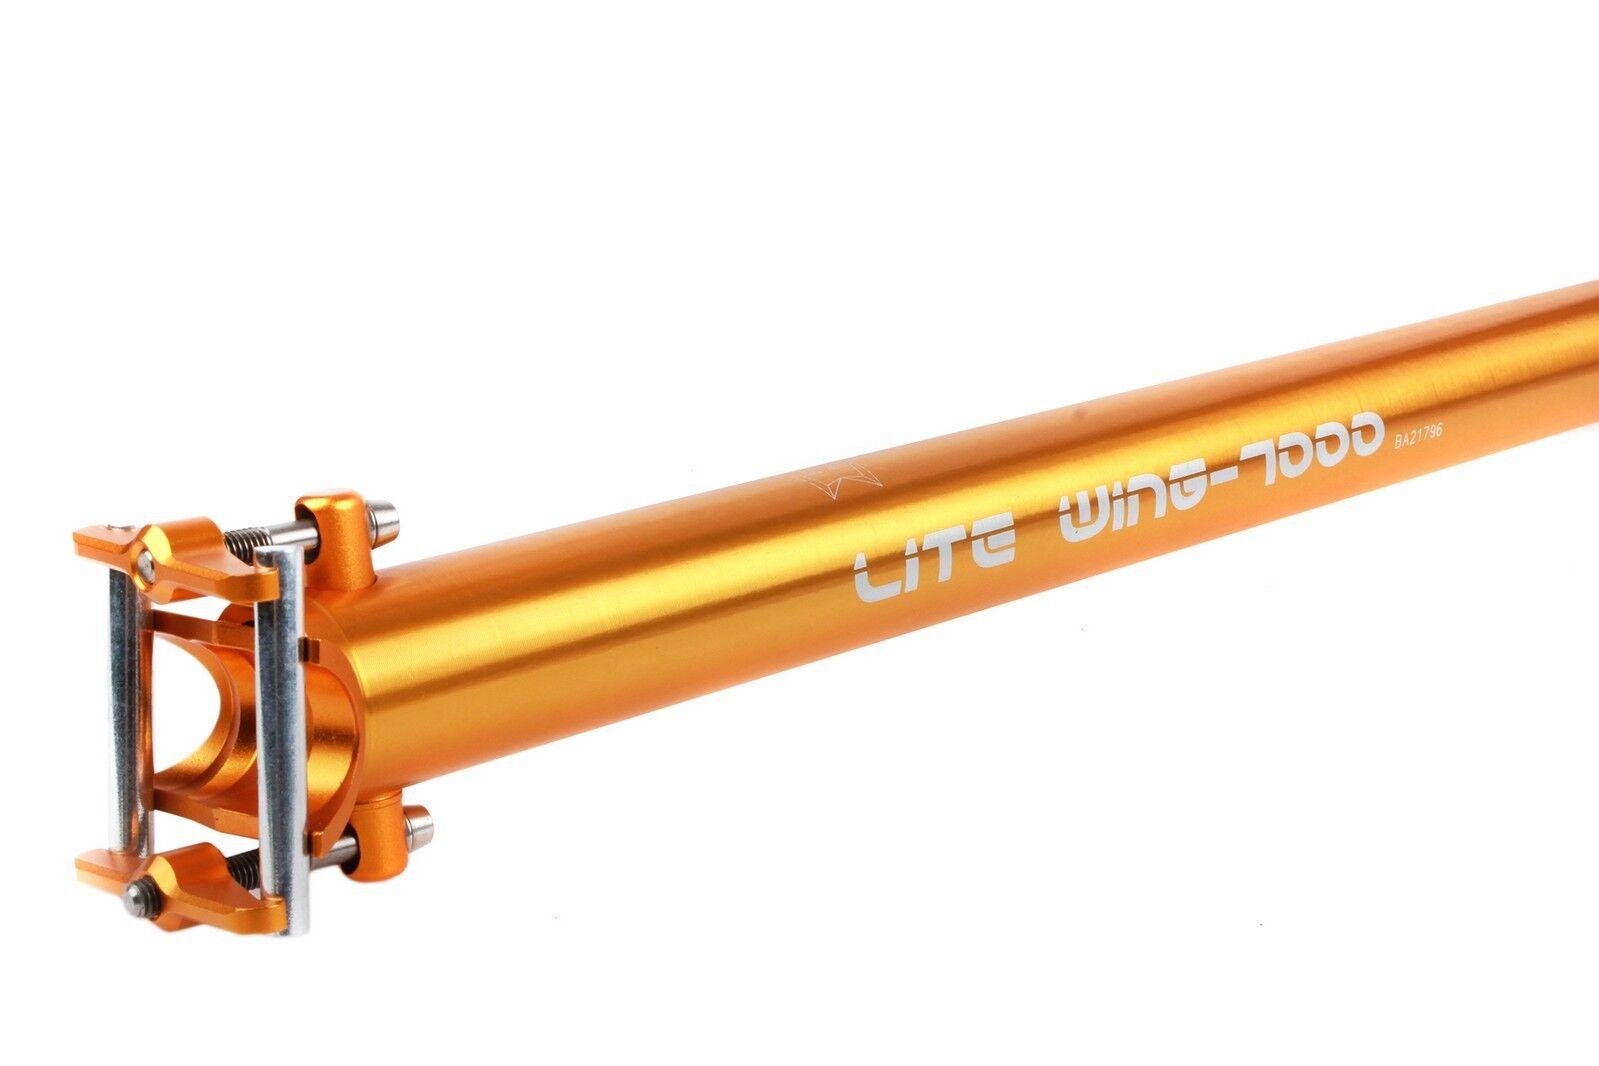 KCNC KCNC KCNC Lite ala Bici Bicicleta Tija de sillín para Dahon plegable pequeña 33.9mm 550mm Dorado e02a09